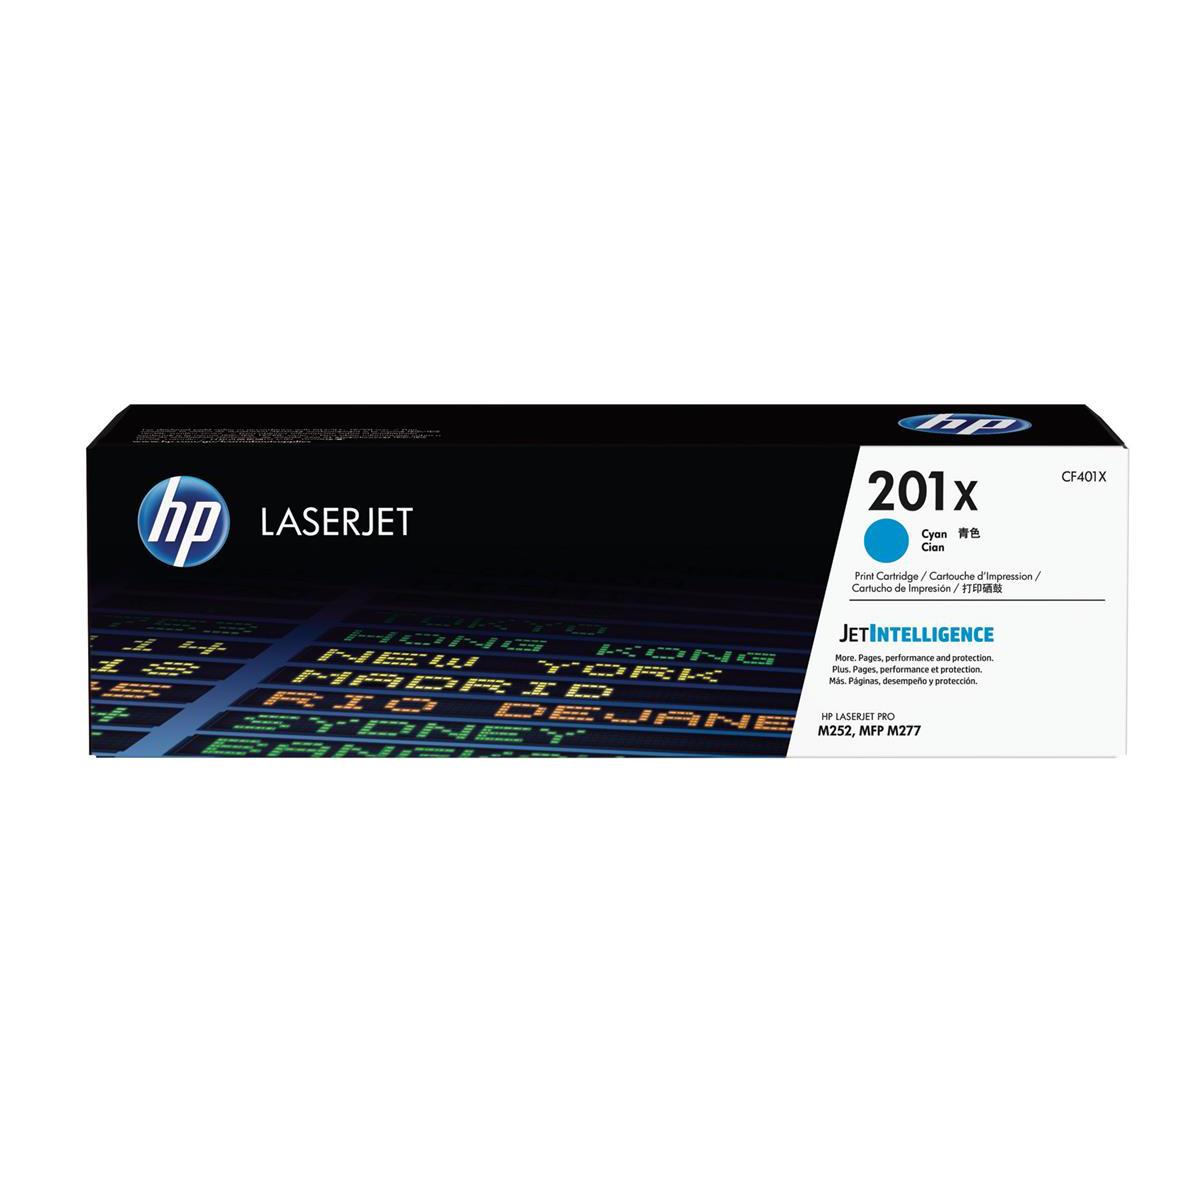 Inkjet Cartridges HP 201X Laserjet Toner Cartridge High Yield Page Life2300pp Cyan Ref CF401X